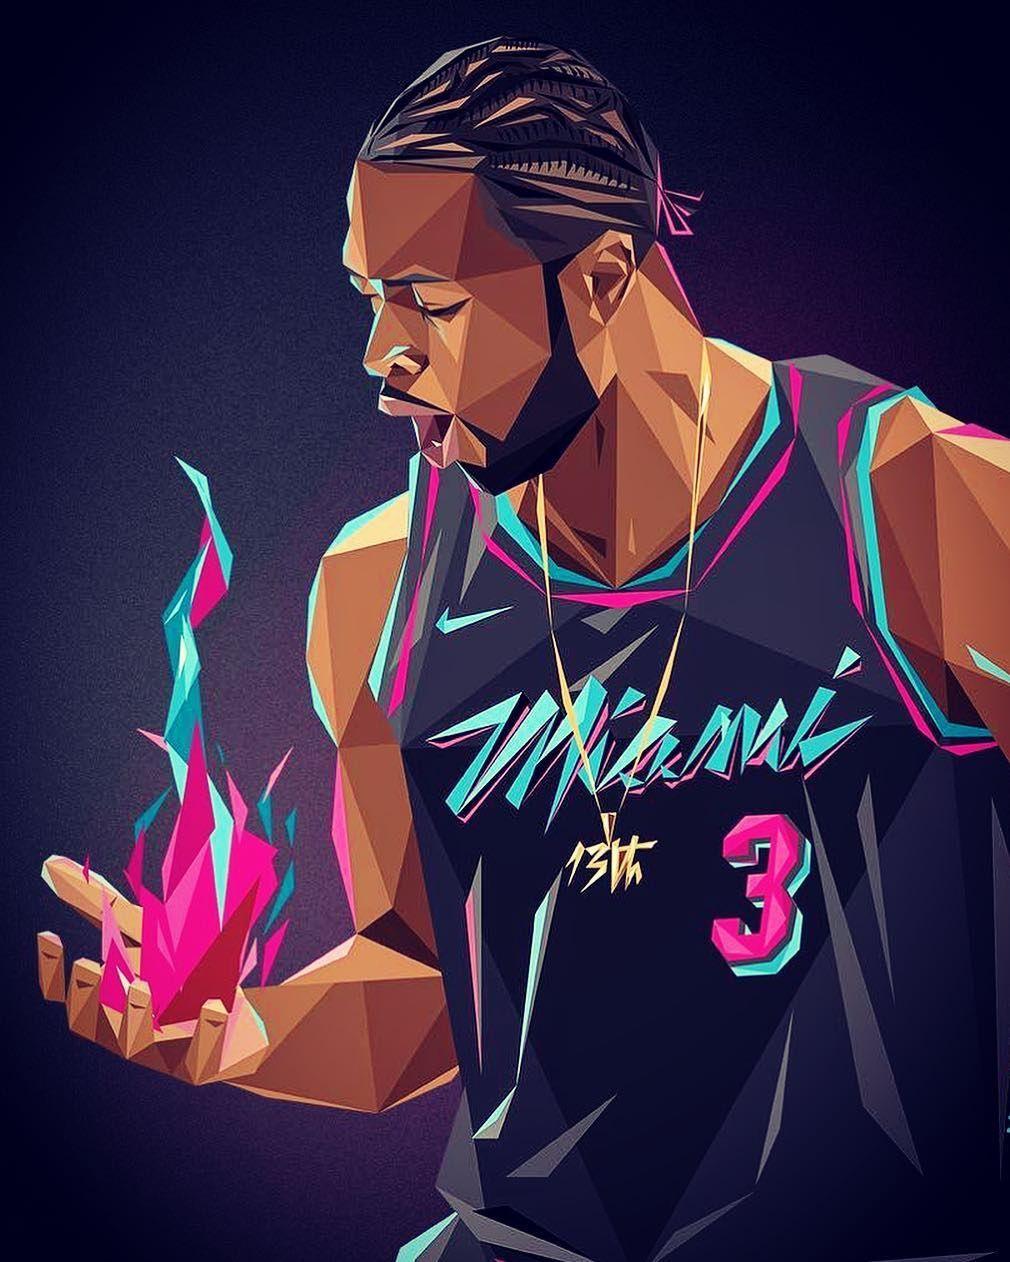 Dwade On That Fire Of Youth Art By 13thvision Consciousbasketball Basketballart Nbaart Dwyanewade Theflash Nba Art Basketball Art Art